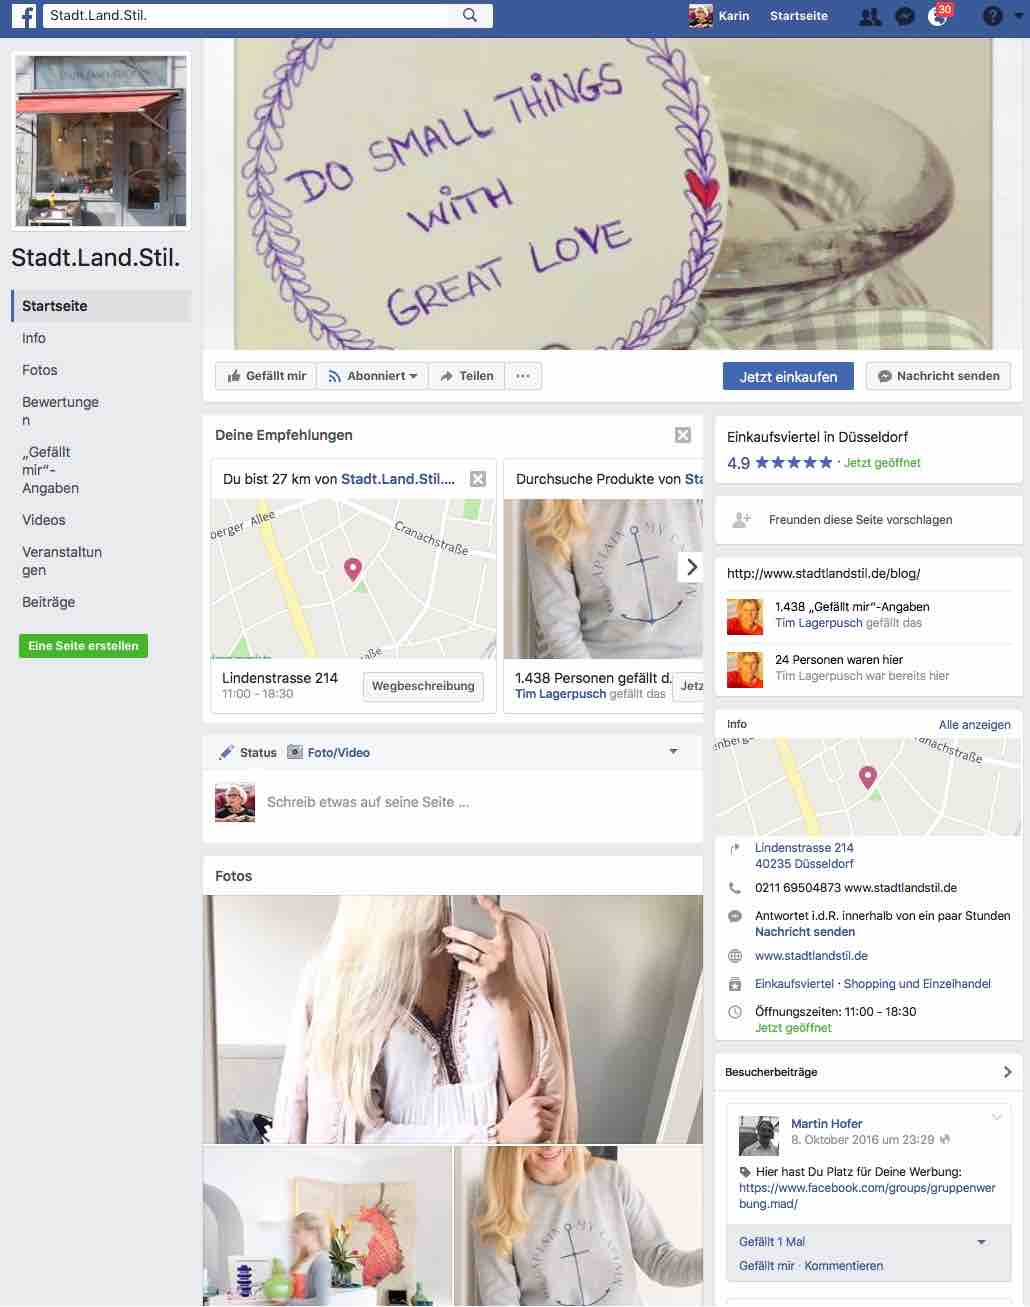 Stadt Land Stil social media erfolgsparameter für den stationären handel